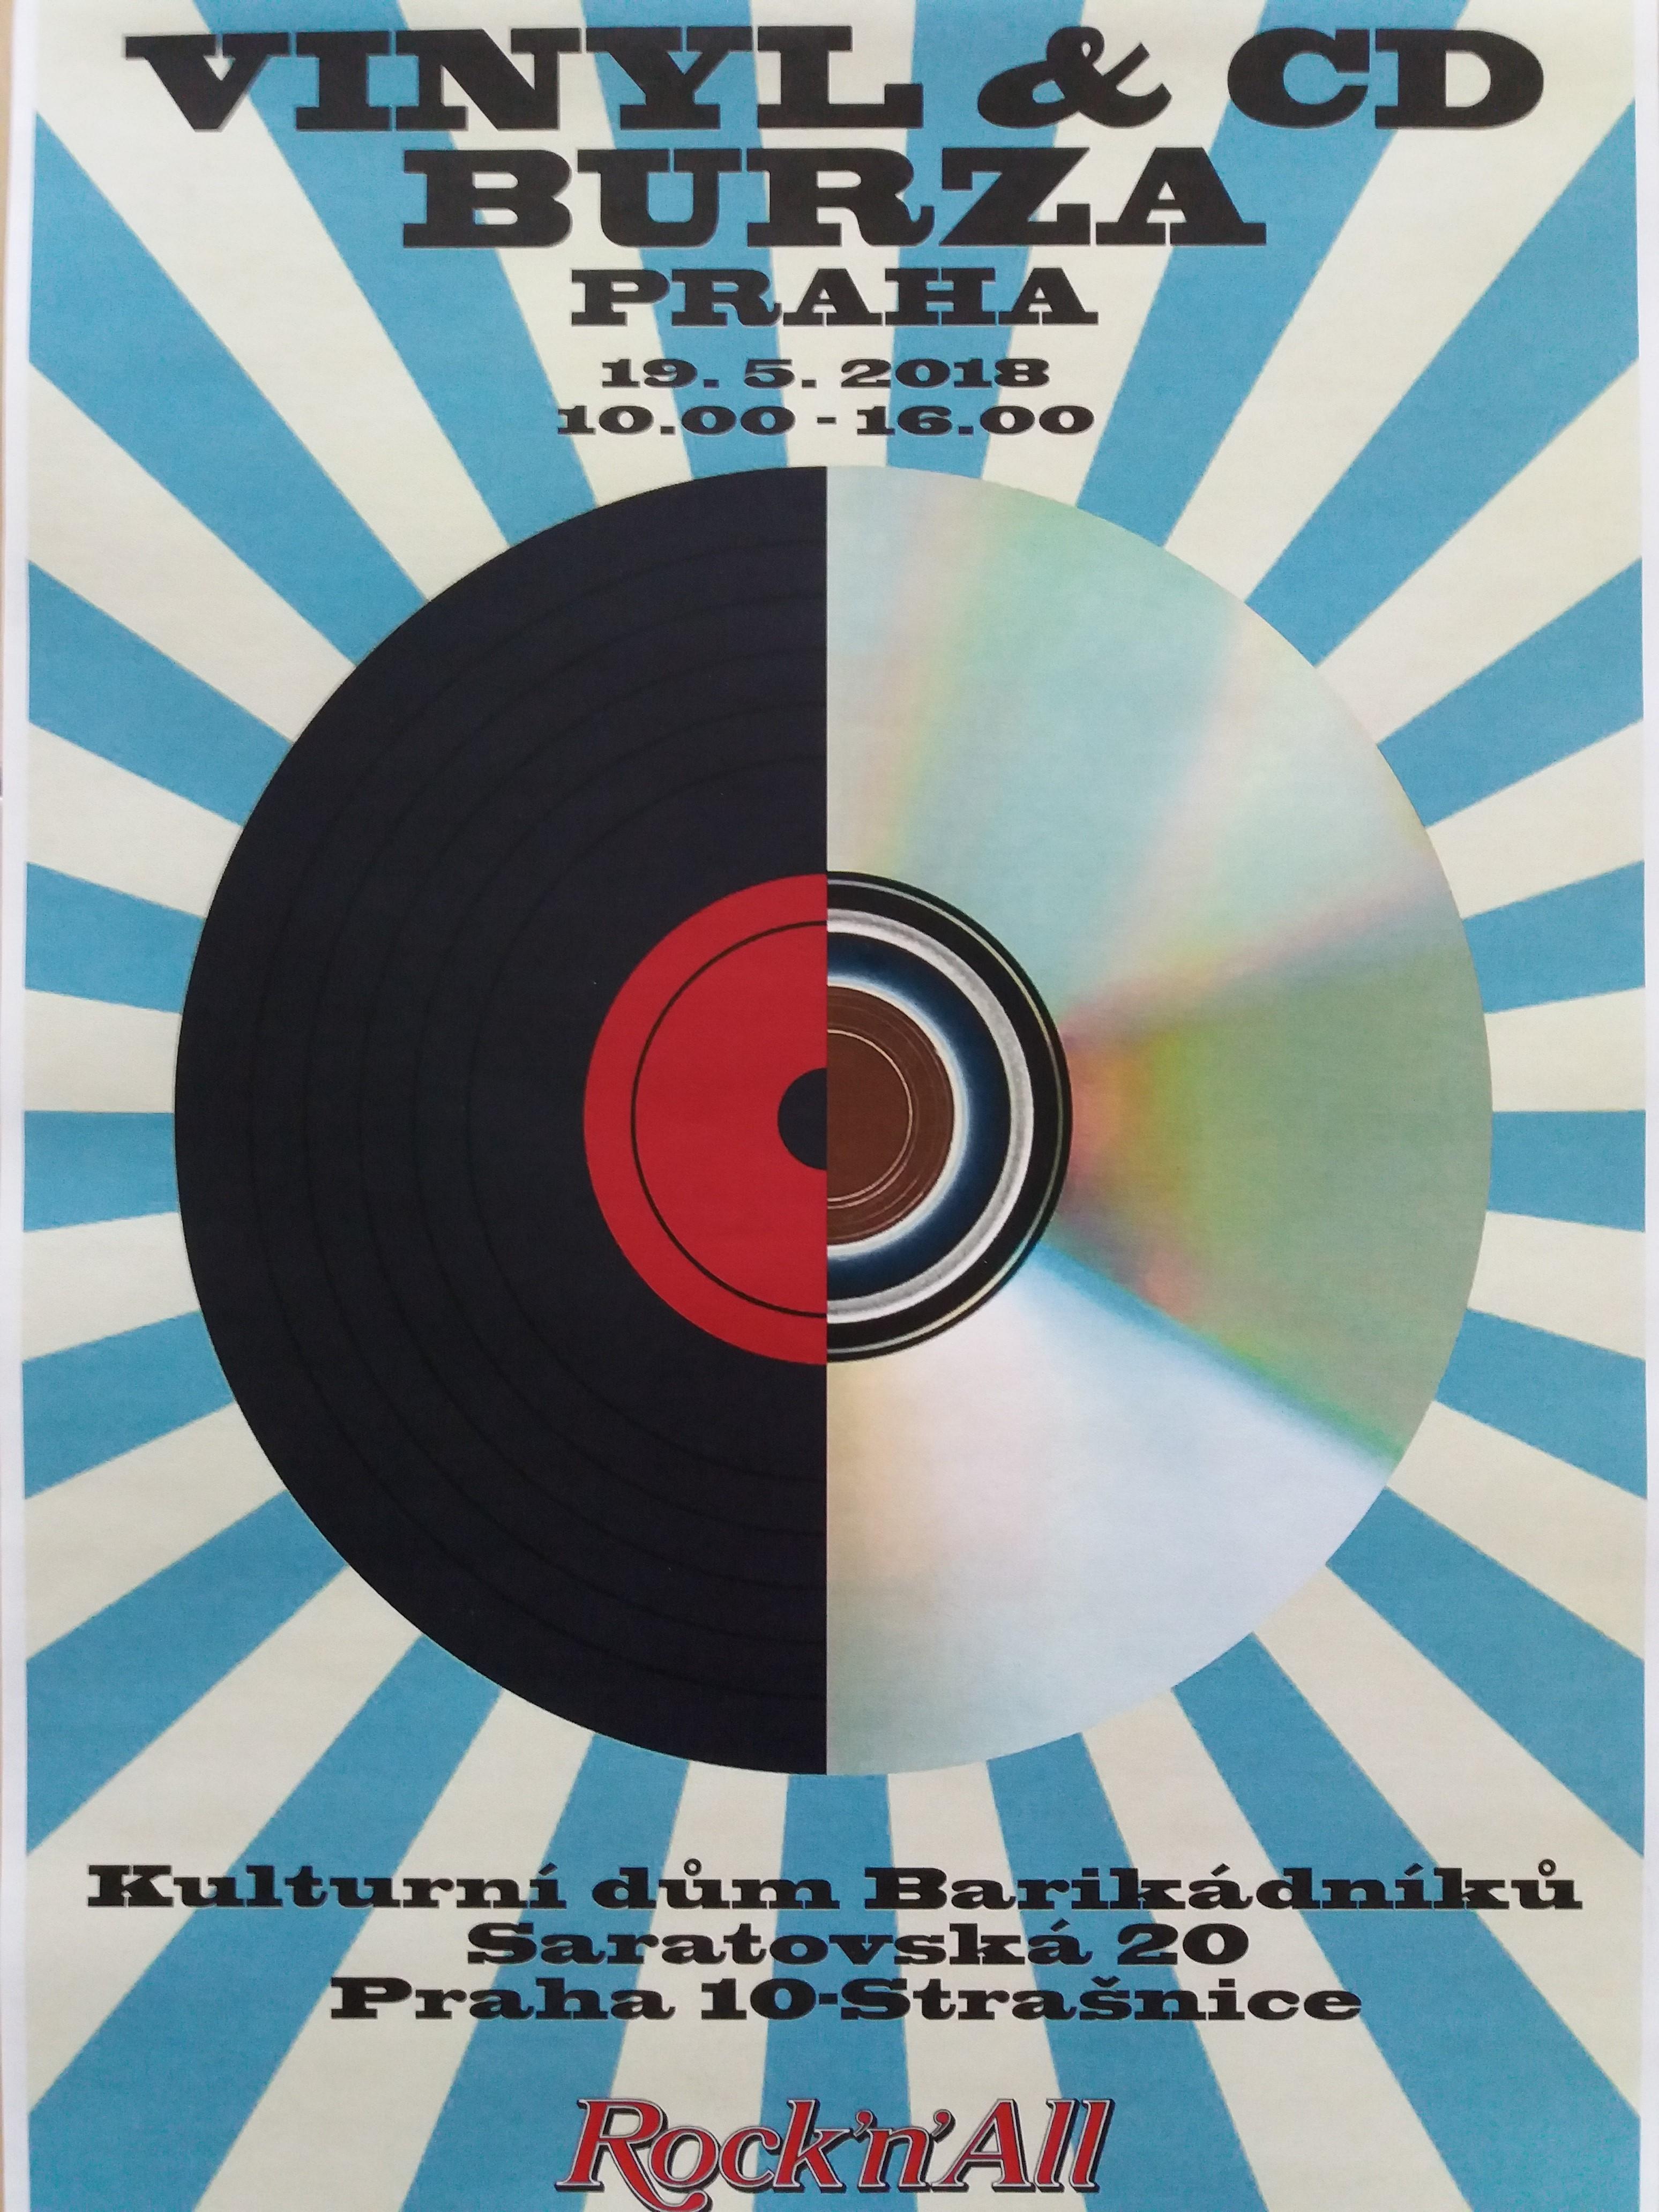 2018 - Vinylová burza